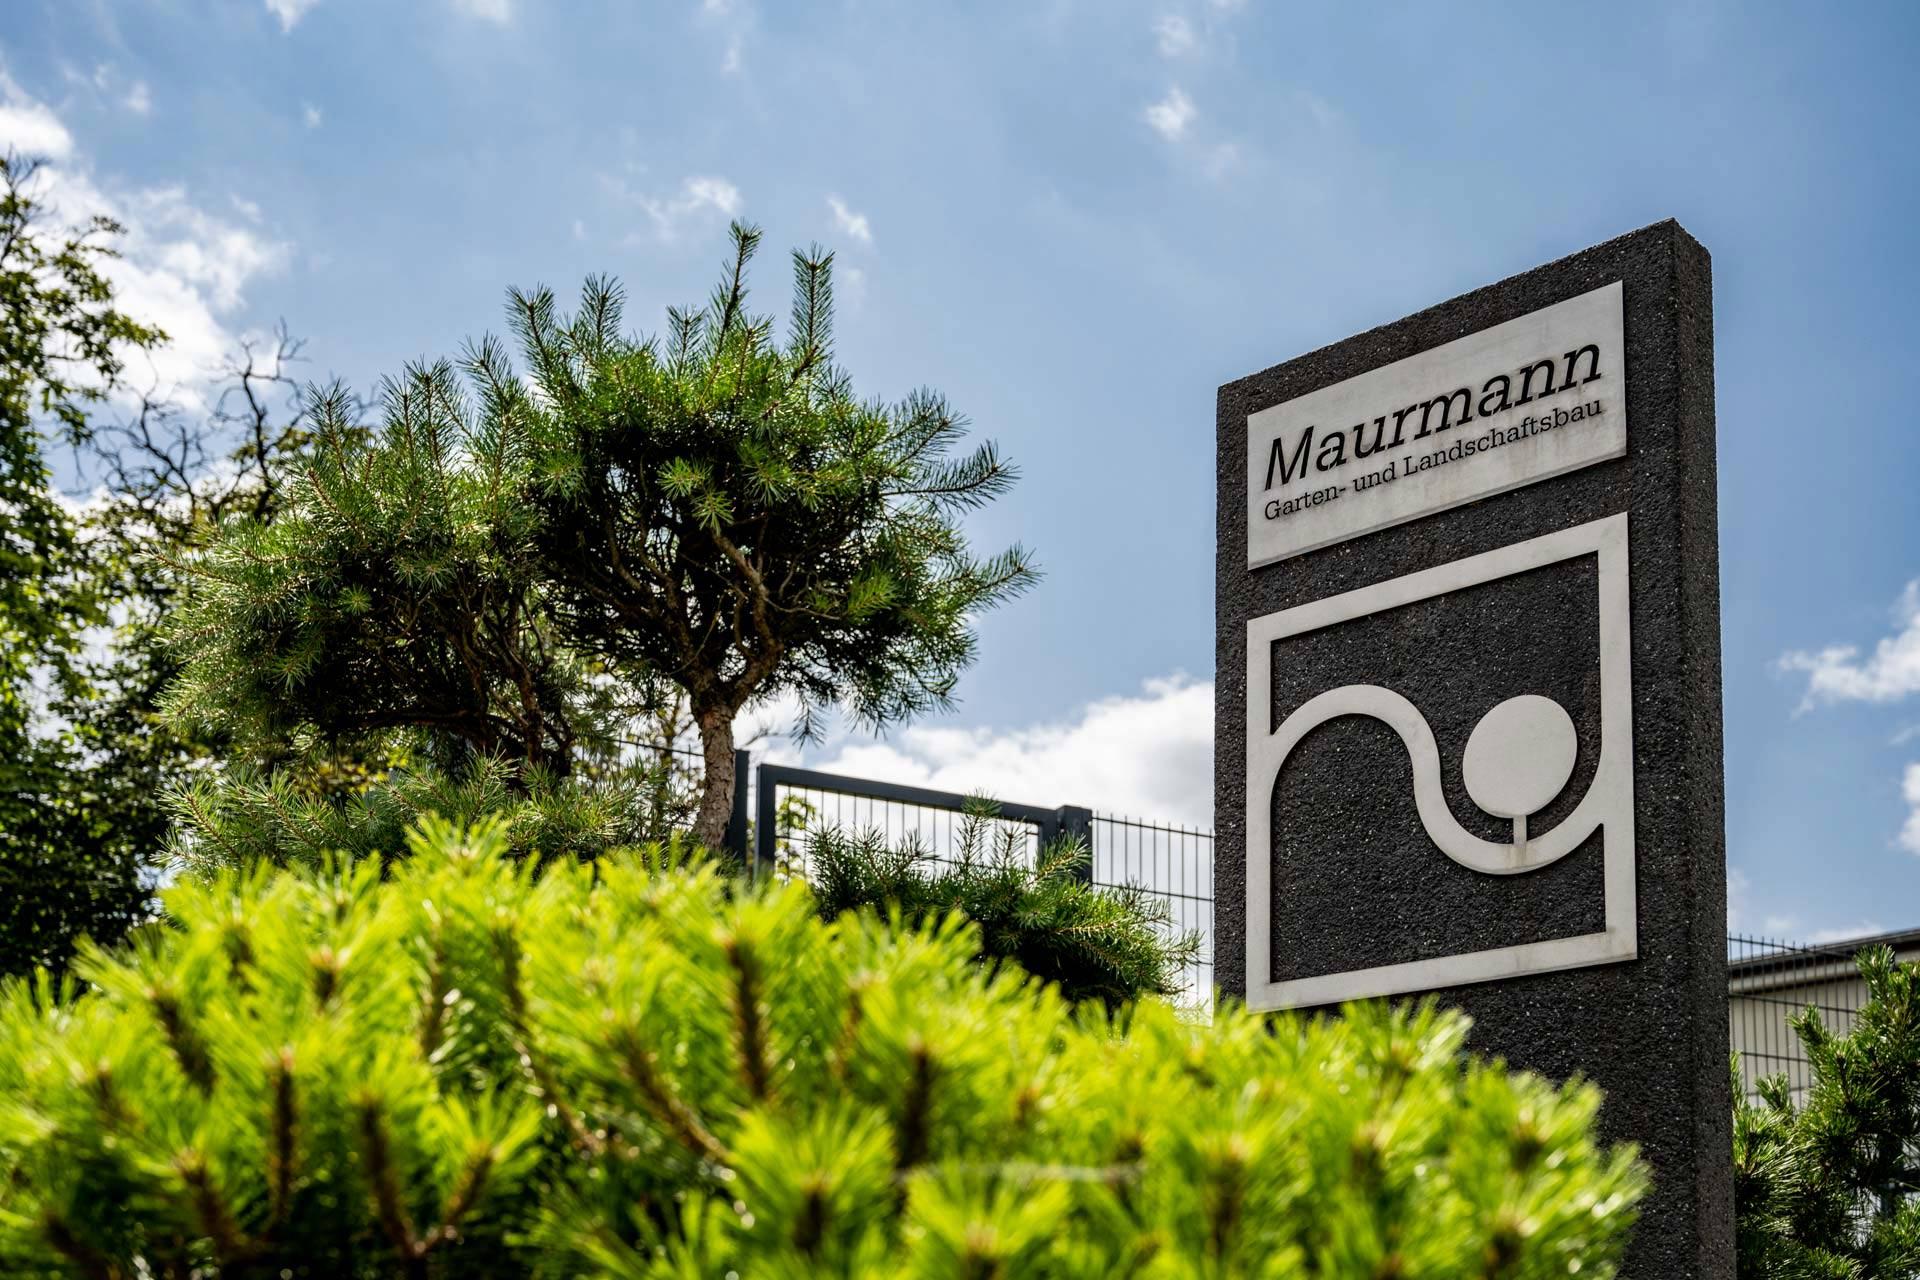 Maurmann Einfahrt